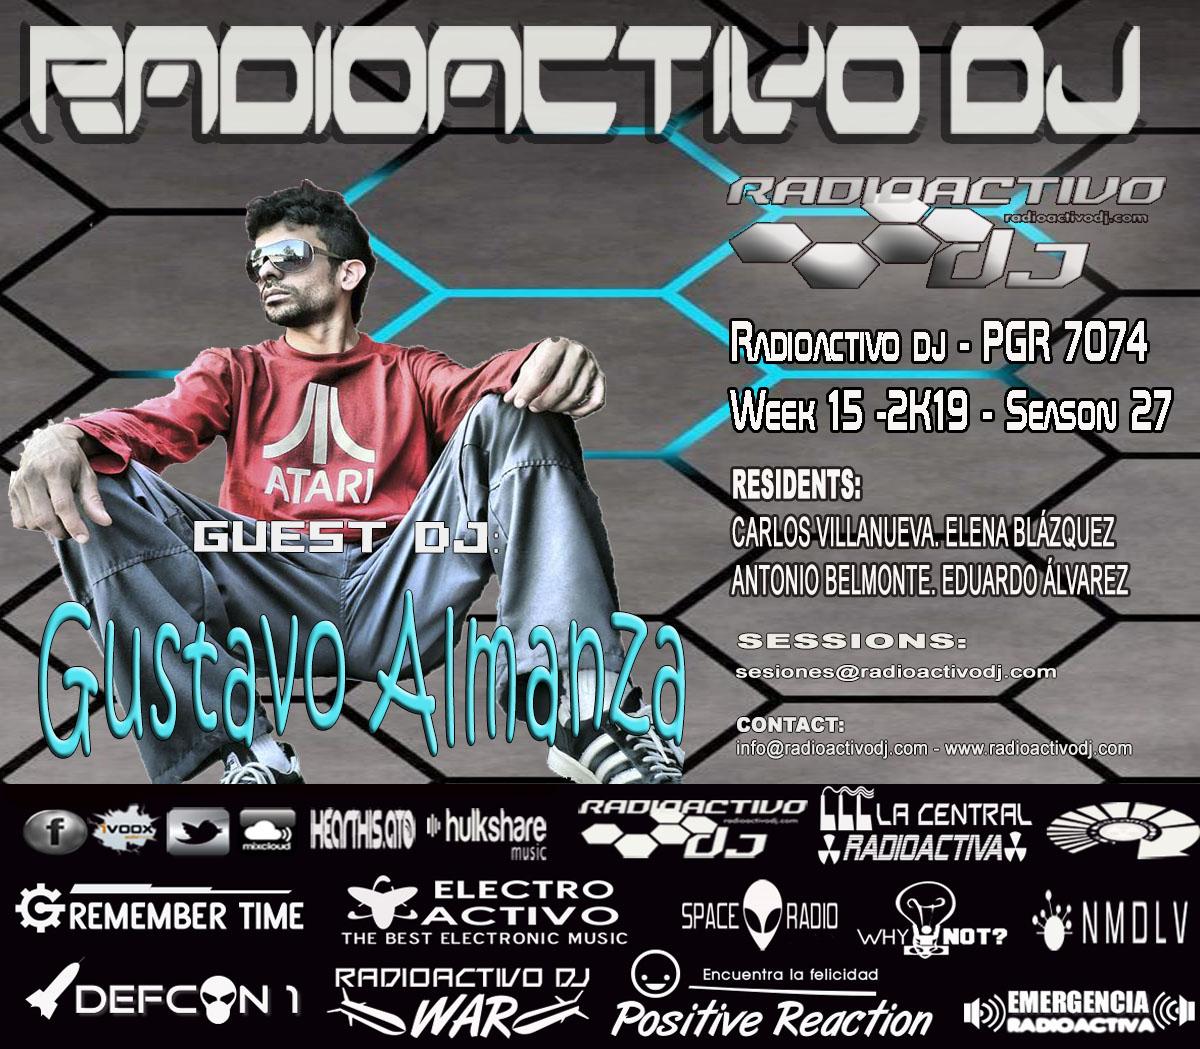 RADIOACTIVO-DJ-15-2019